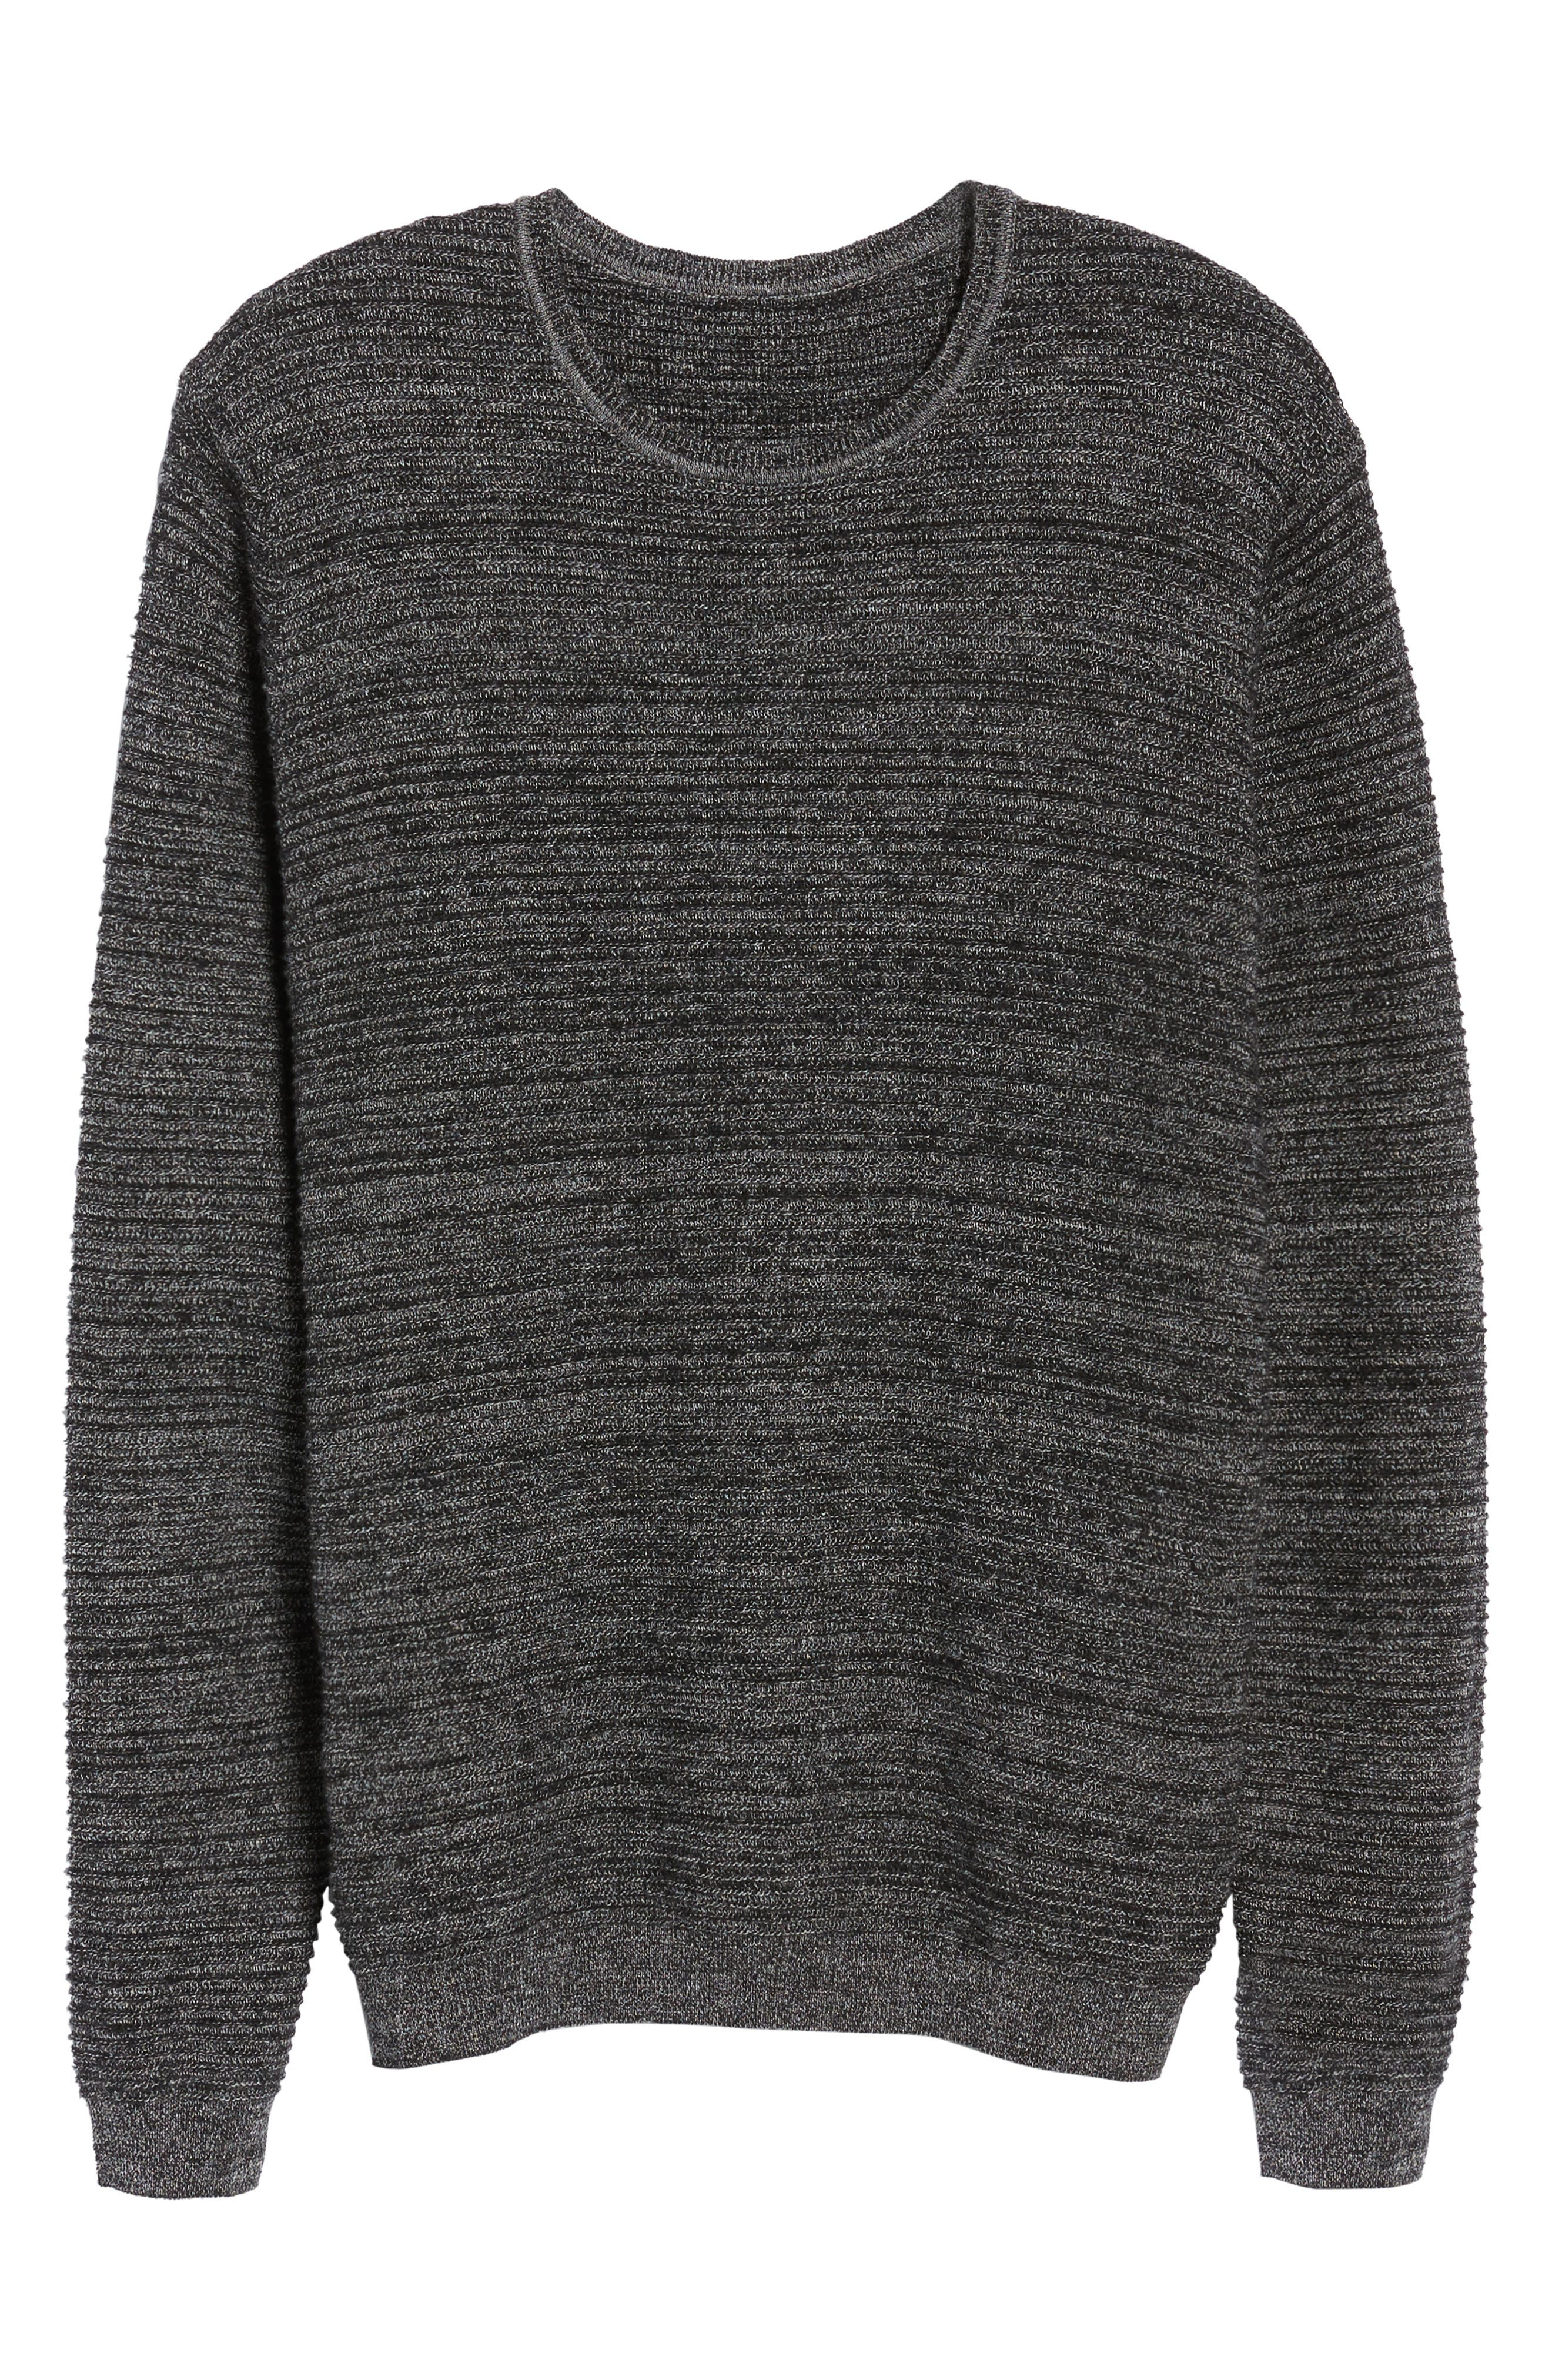 Ottoman Wool Blend Sweater,                             Alternate thumbnail 6, color,